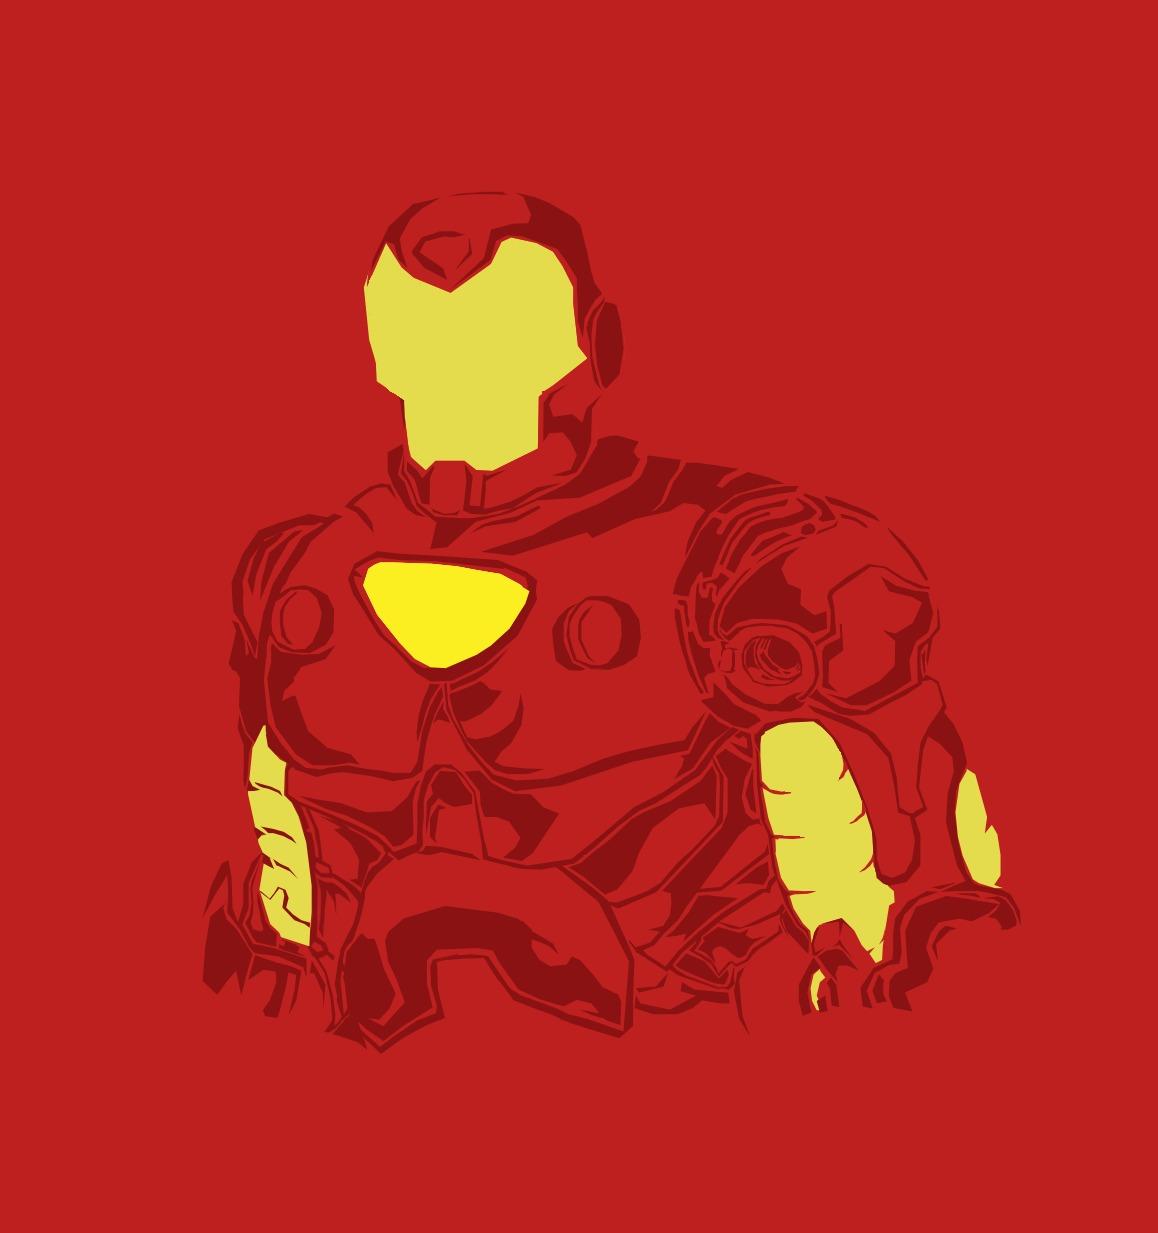 Simplistic Iron Man